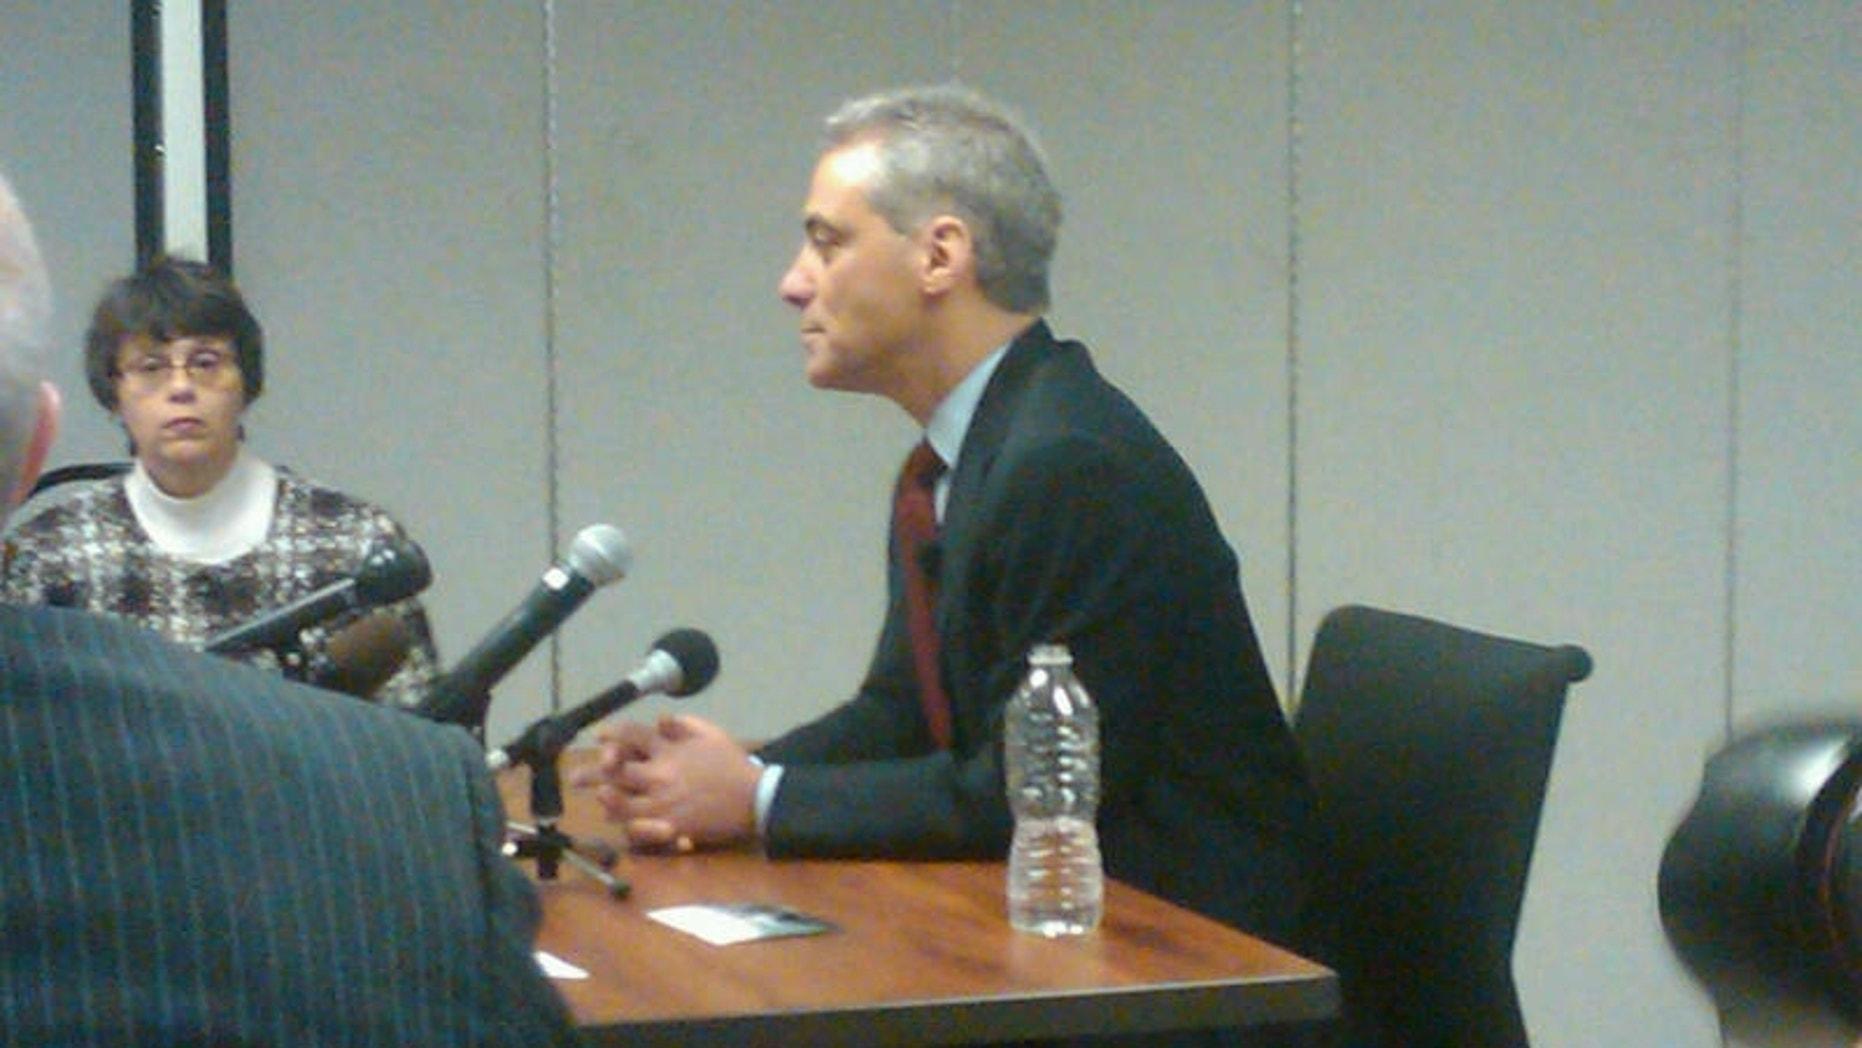 Rahm Emanuel in the Witness Chair (Fox News Photo / Marla Cichowski)